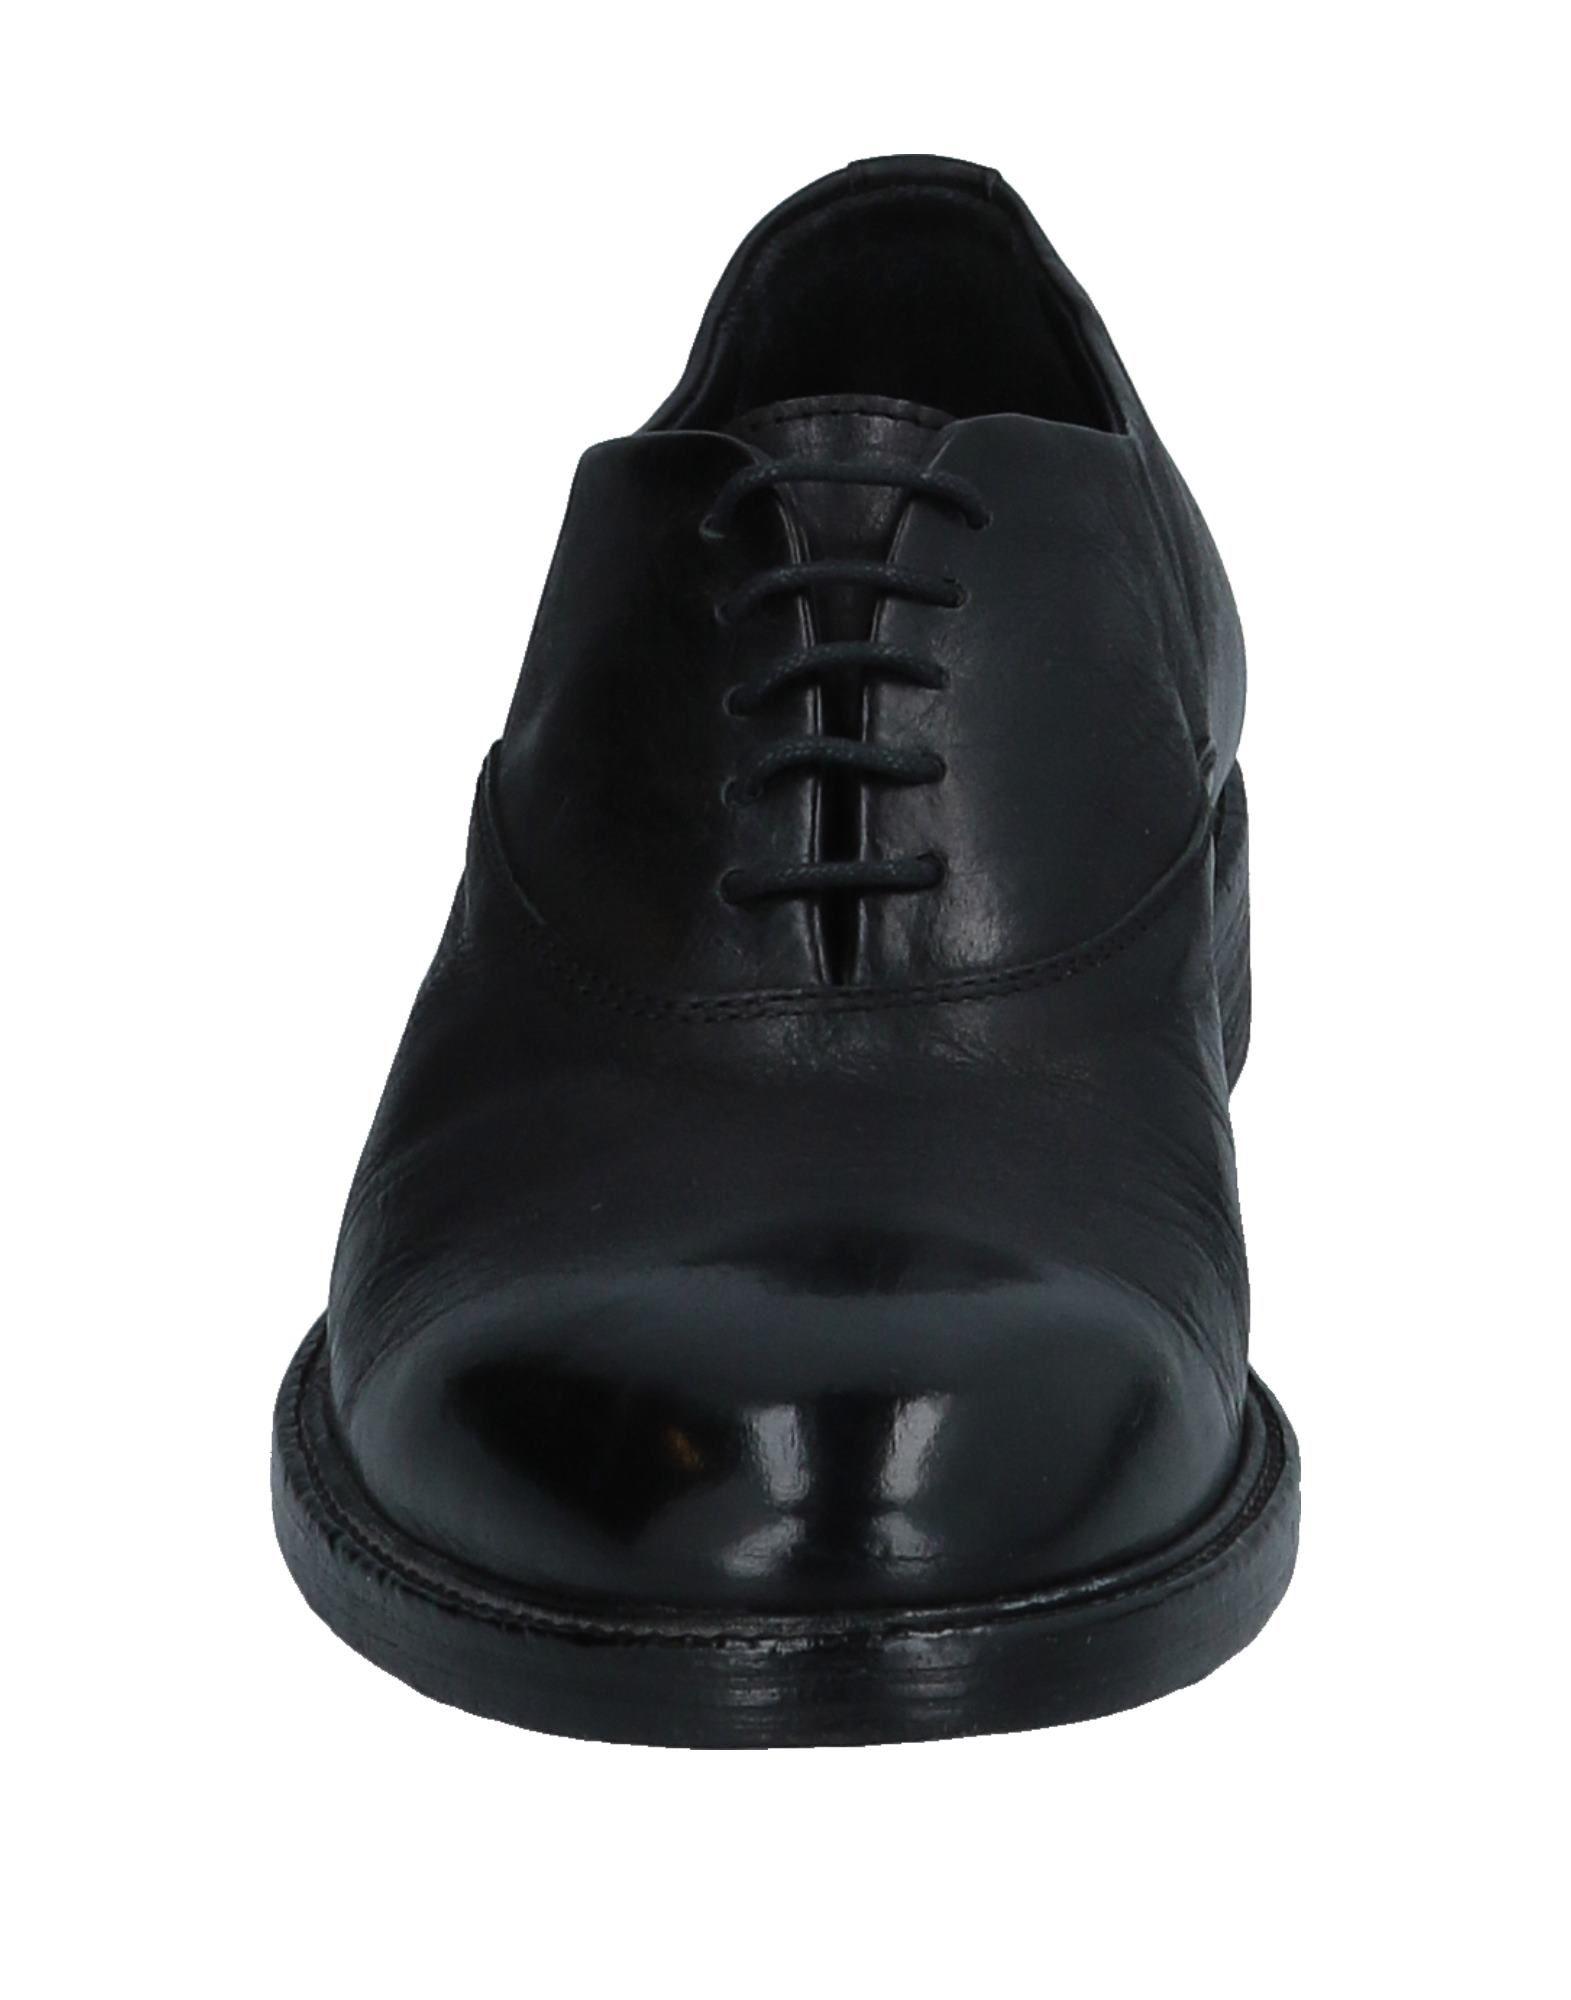 Savio Barbato Schnürschuhe Herren  11536882MF 11536882MF 11536882MF Neue Schuhe 9e7e6c